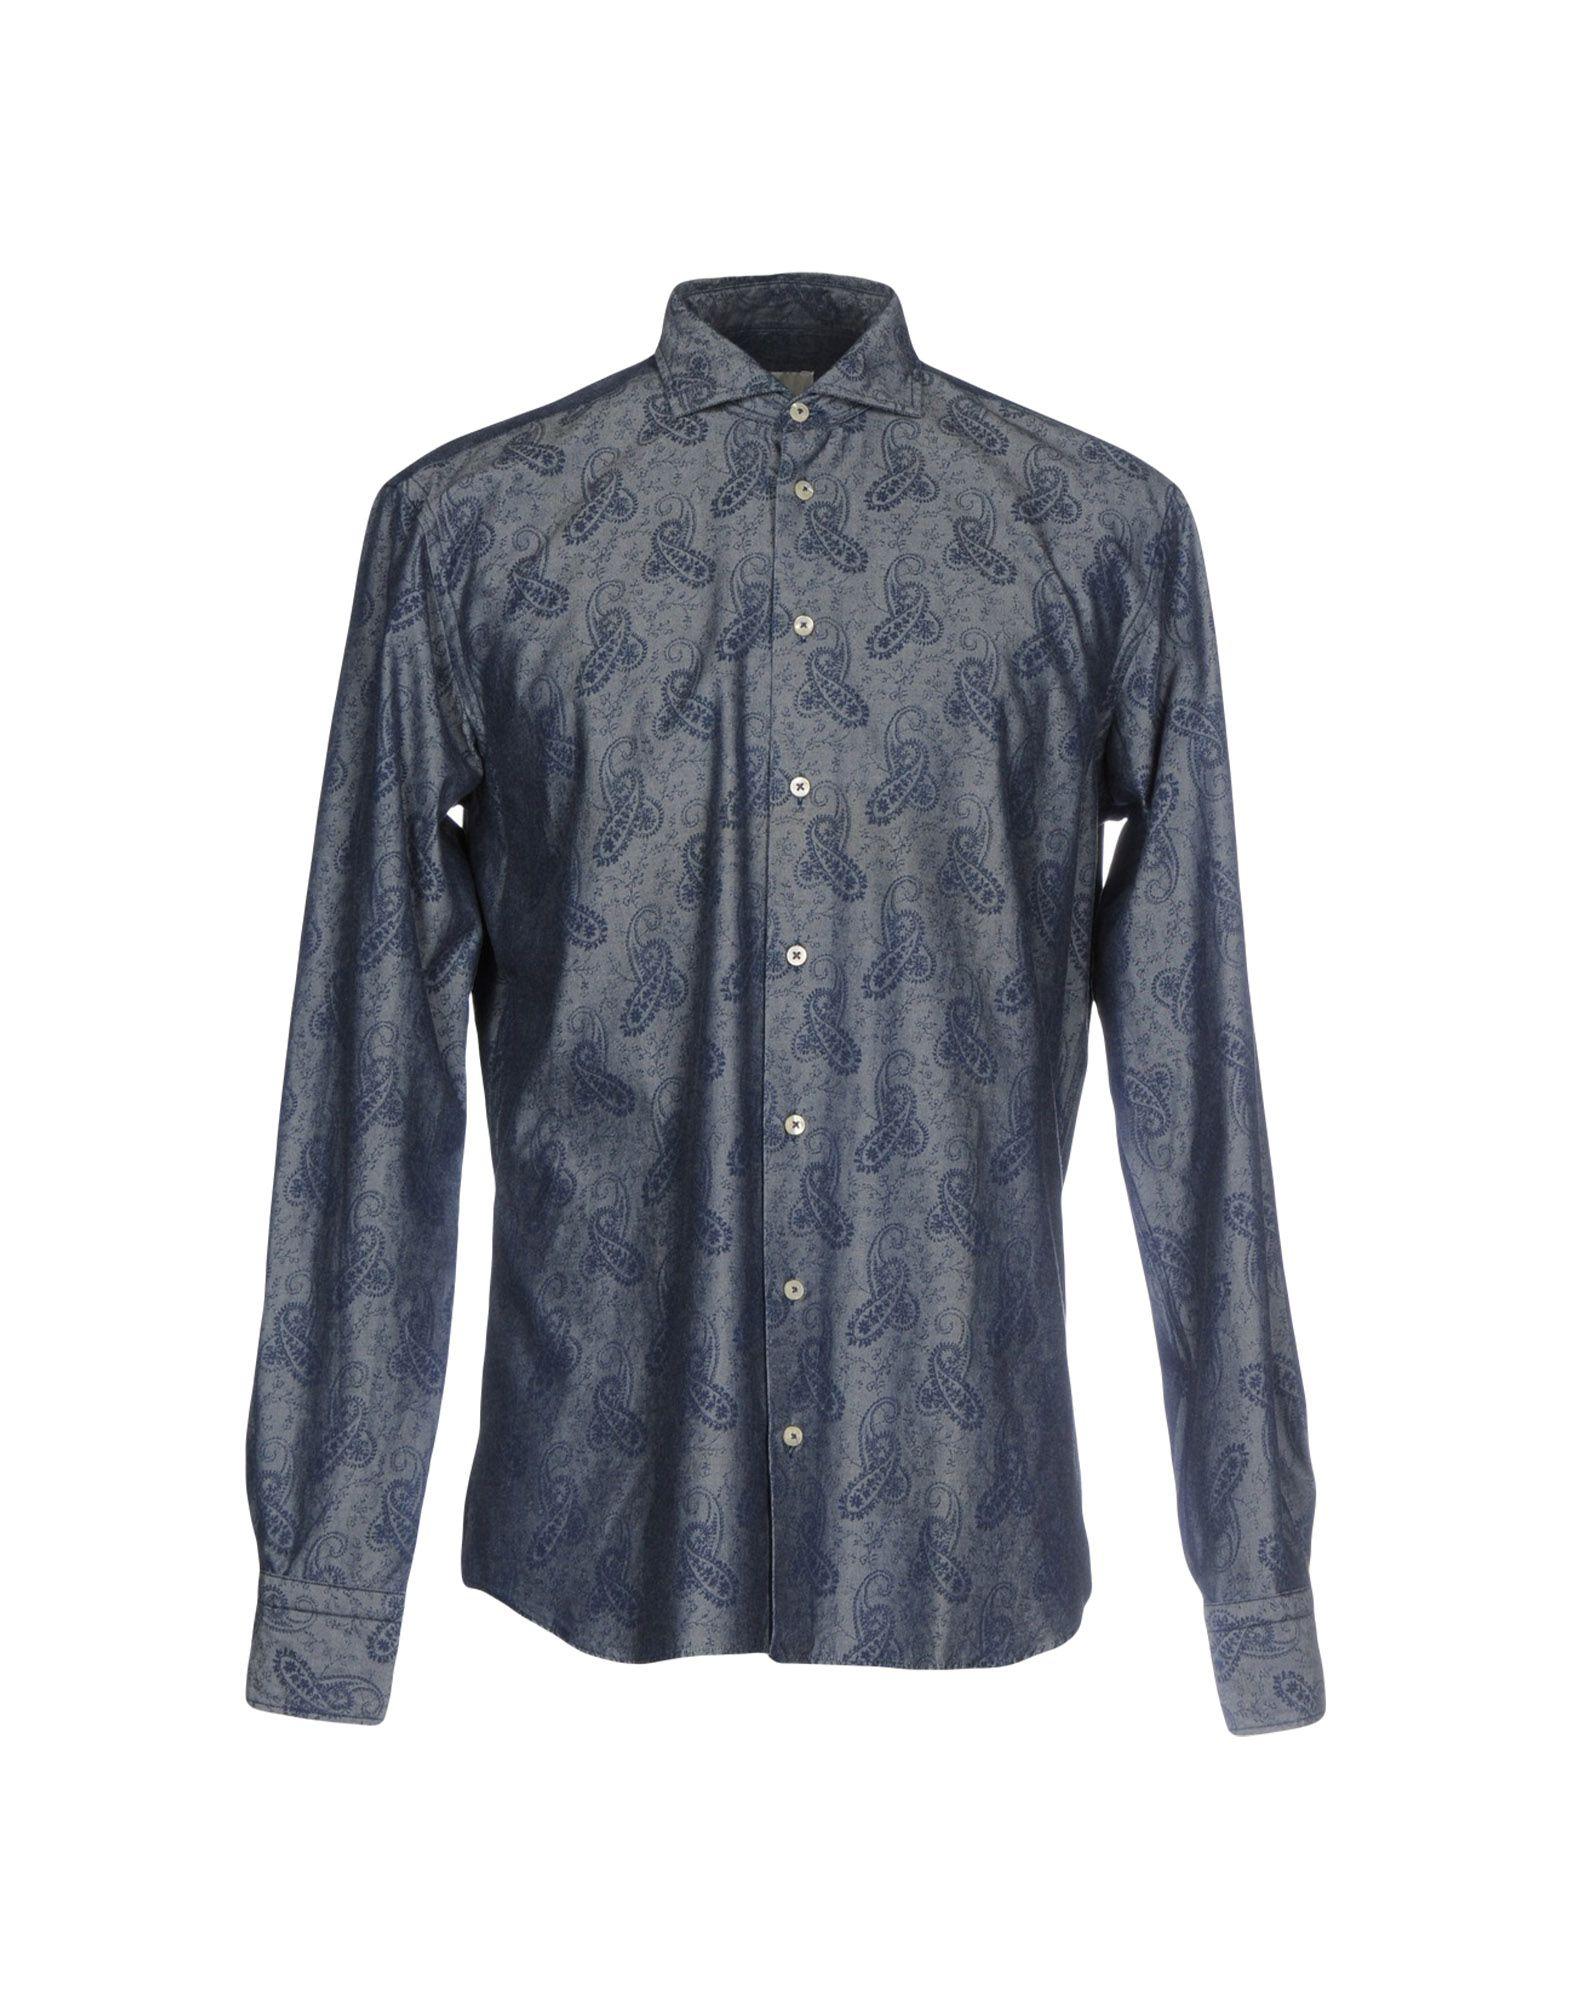 JEY COLE MAN Джинсовая рубашка цена 2017